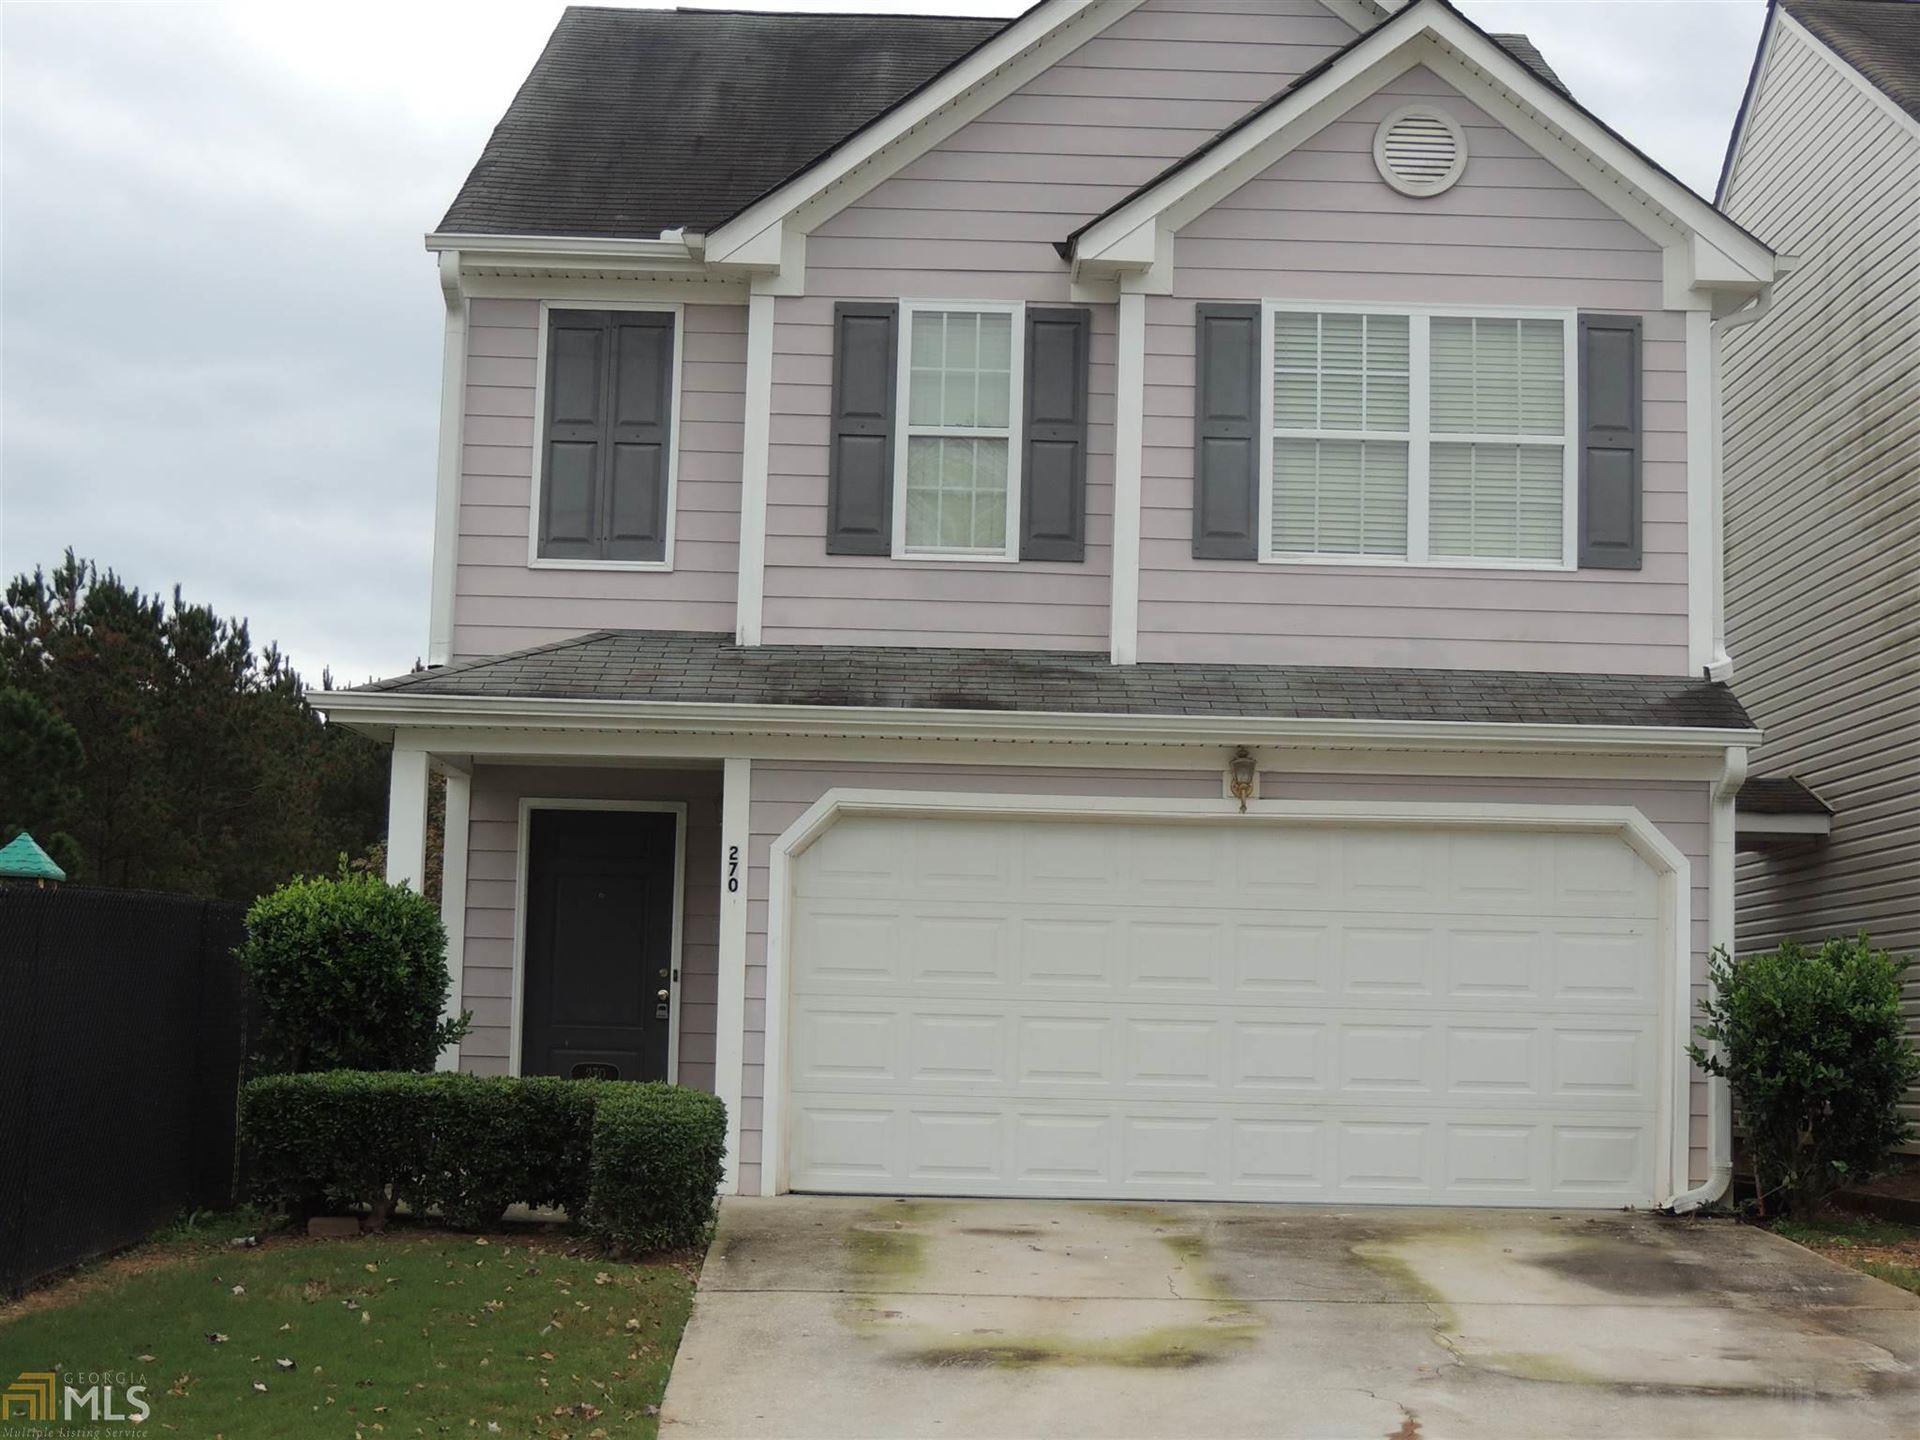 270 Crestfield Cir, Covington, GA 30016 - MLS#: 8889781